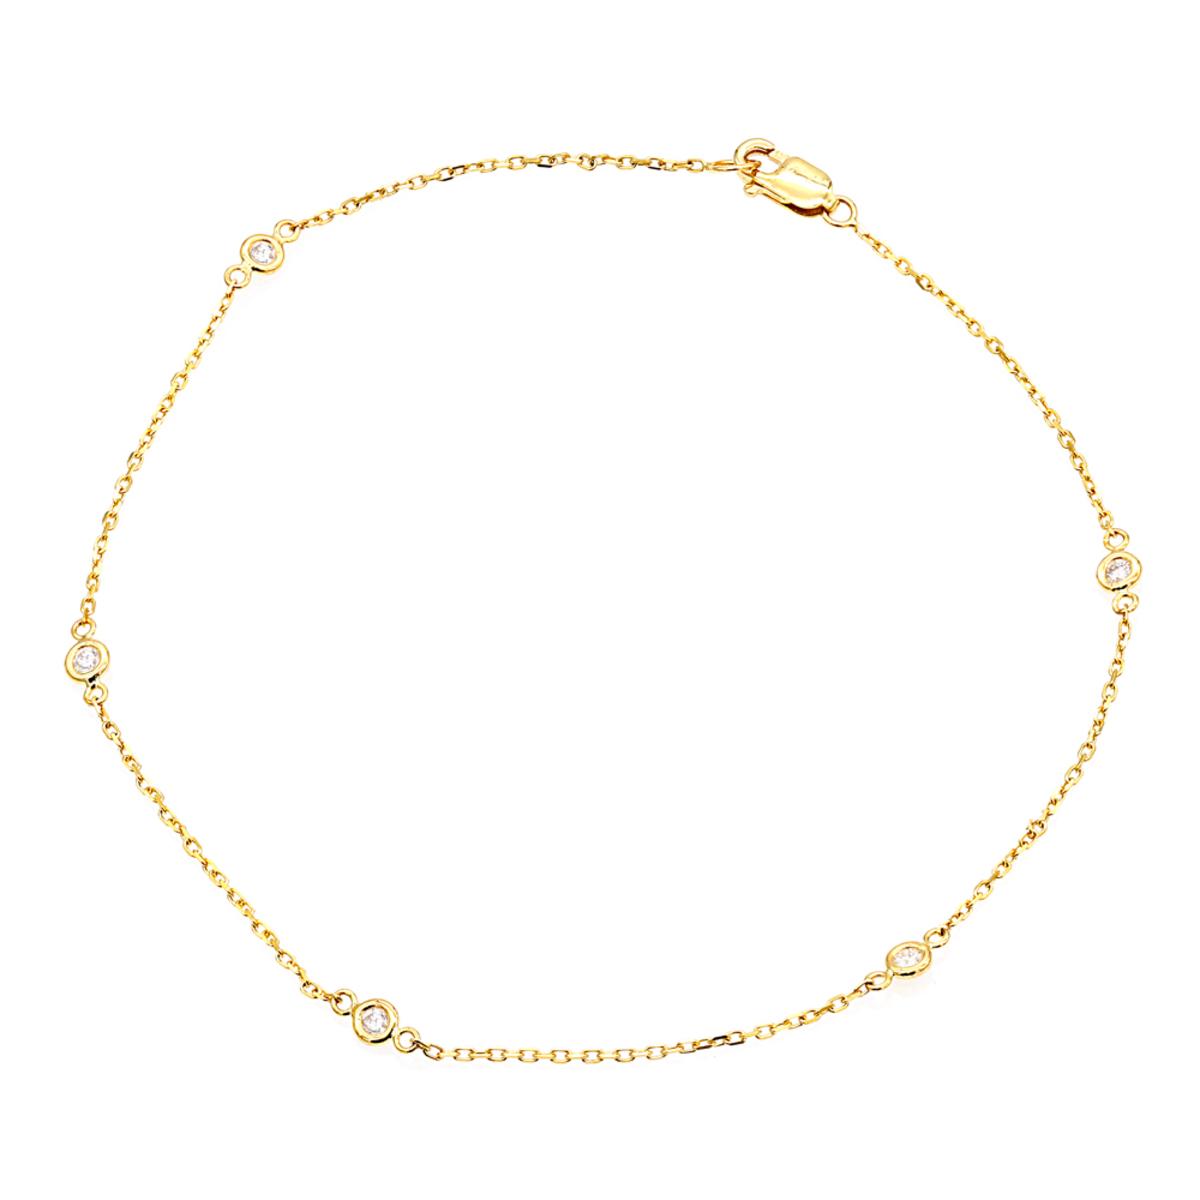 Diamond by the Yard Solid 14K Gold Ankle Bracelet with Diamonds by Luxurman